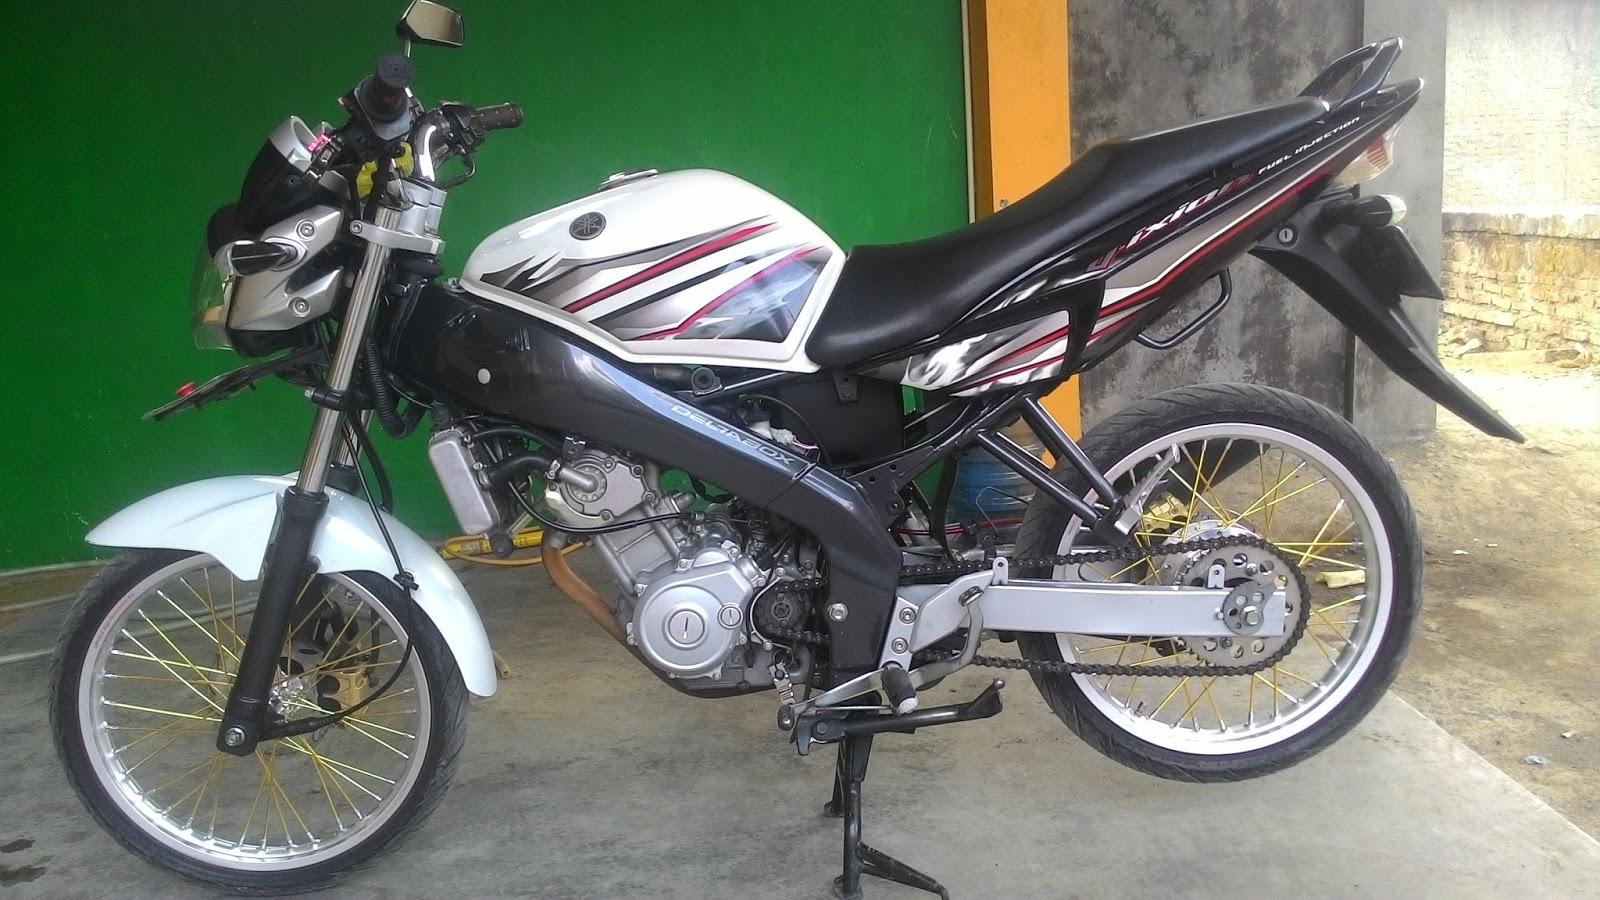 Download 70 Modifikasi Yamaha Vixion 2012 Terbaik Kempoul Motor